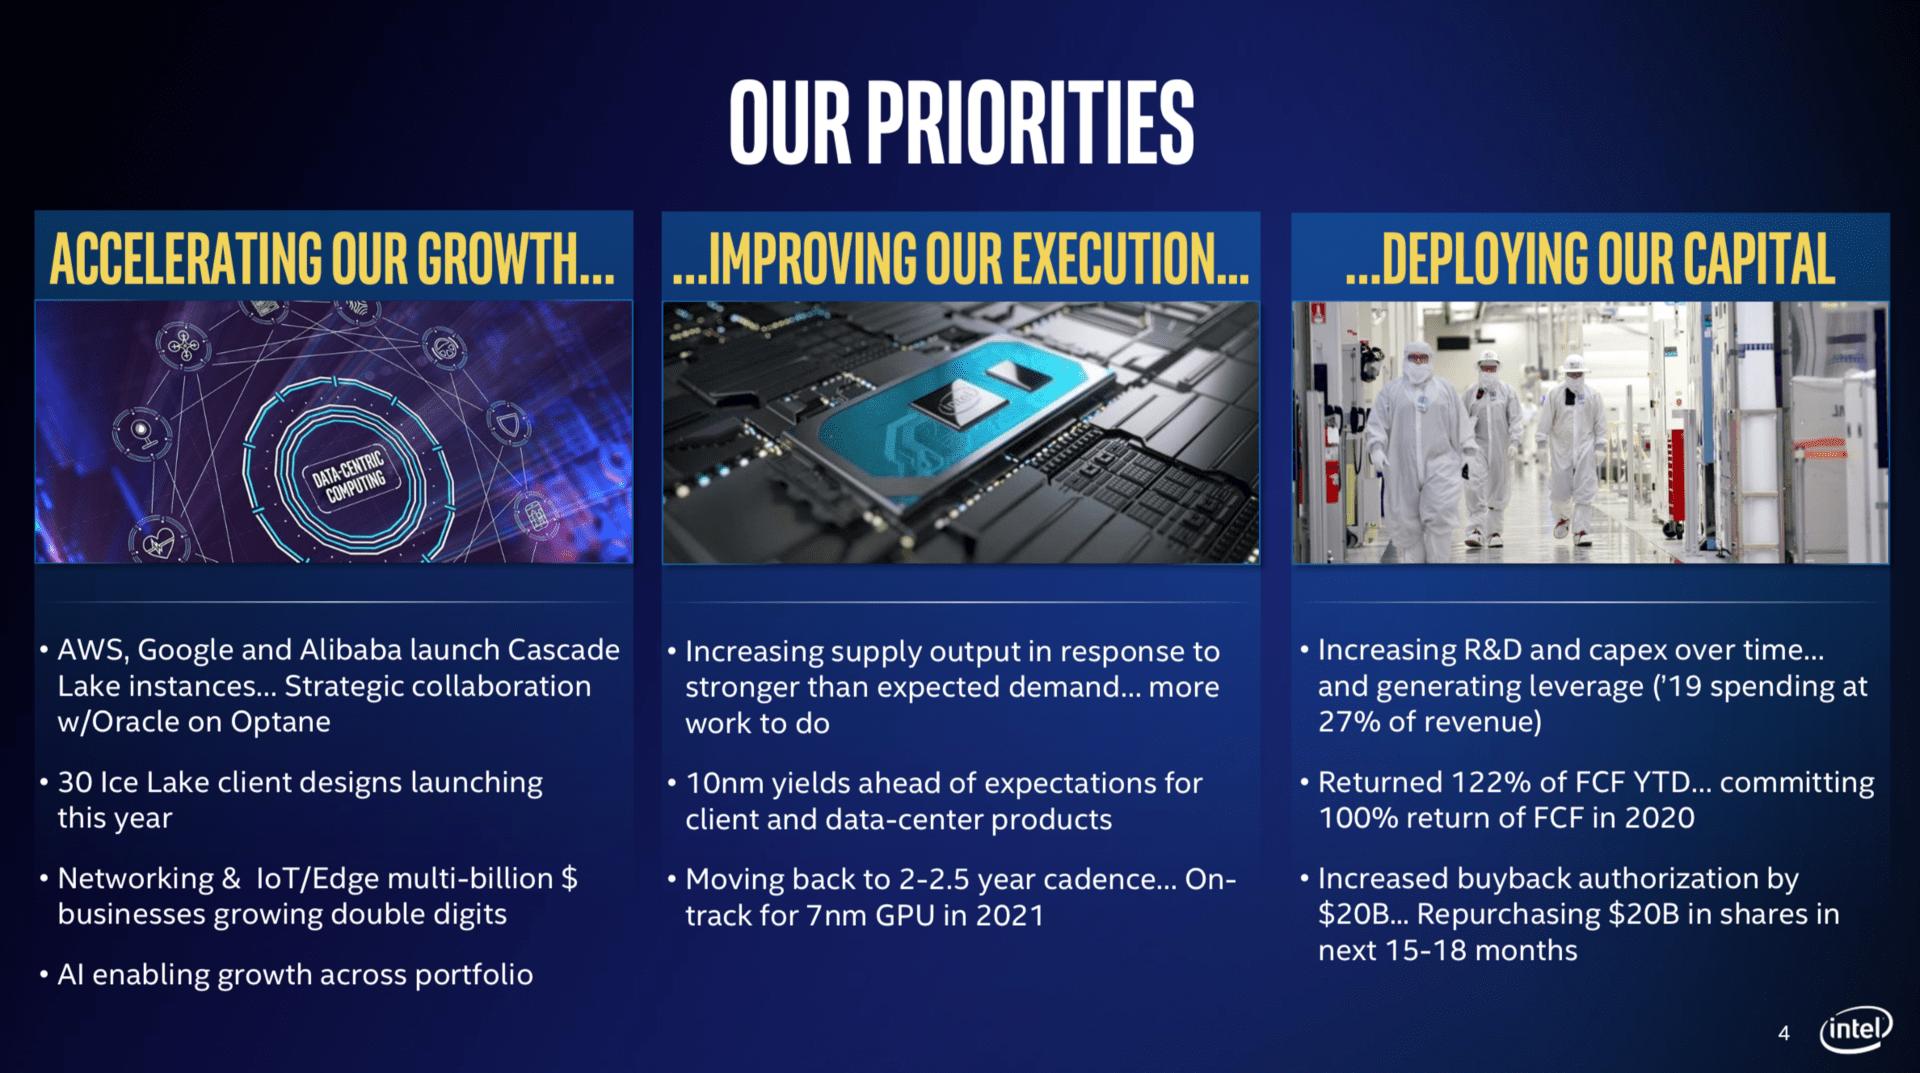 Intels Prioritäten Ende 2019